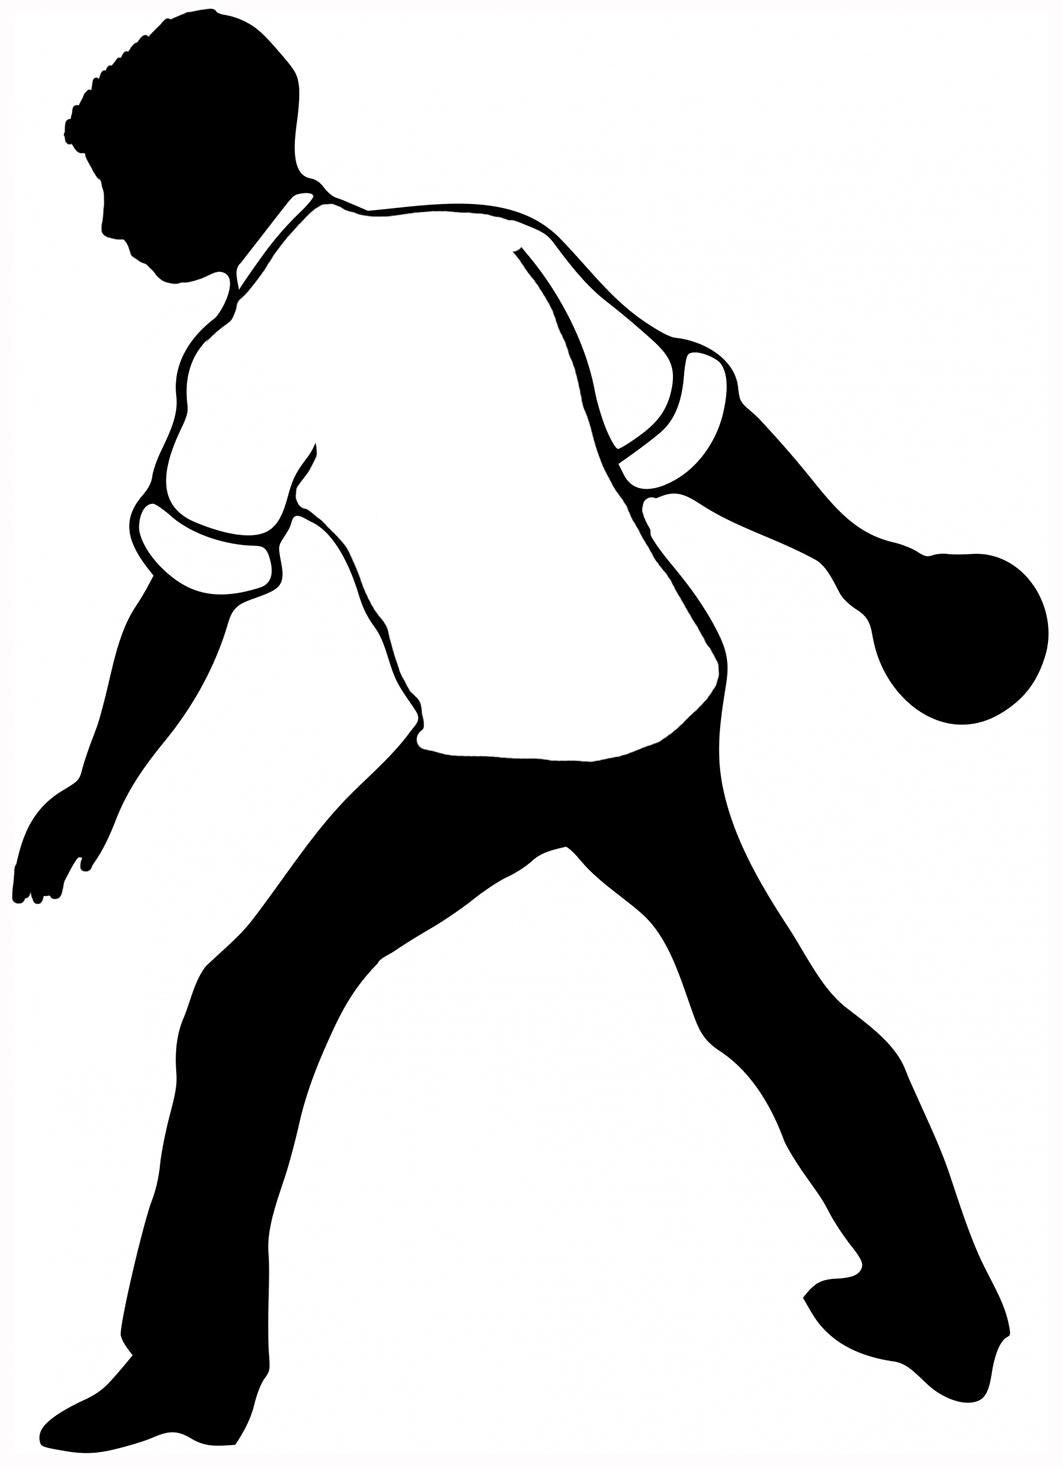 bowling silhouette black white